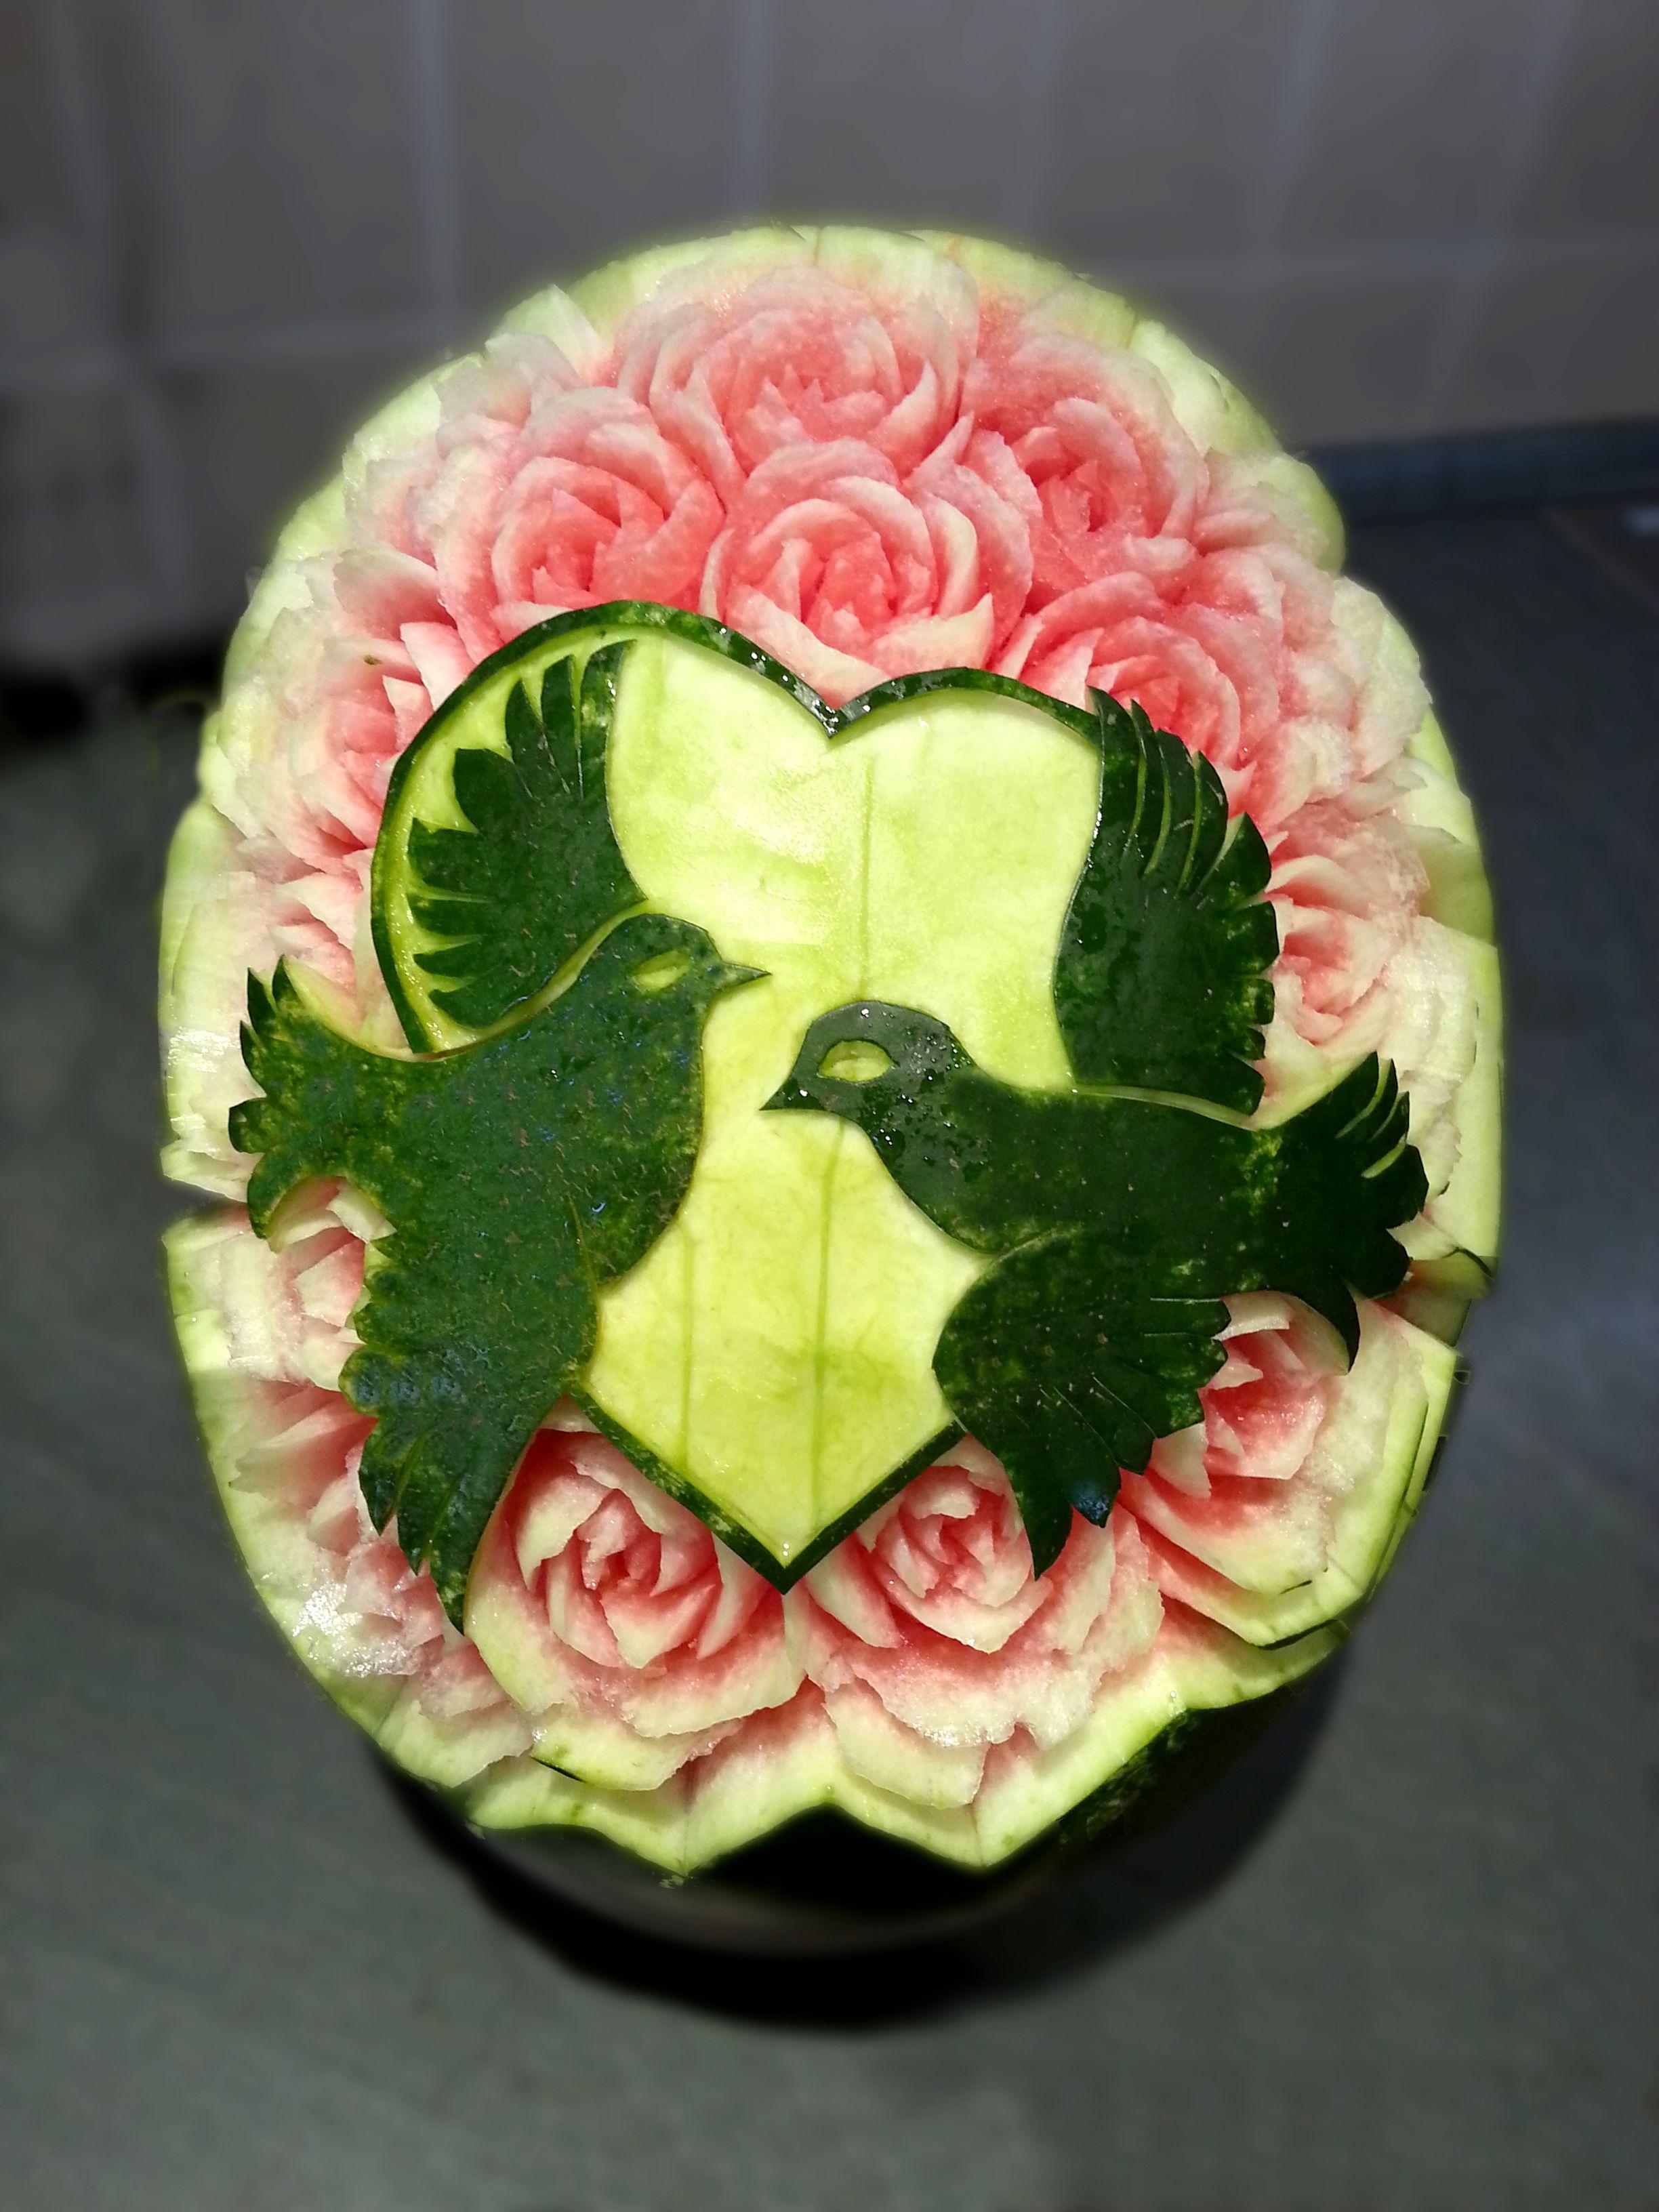 Watermelon carving wedding inspiration fruit vegetable